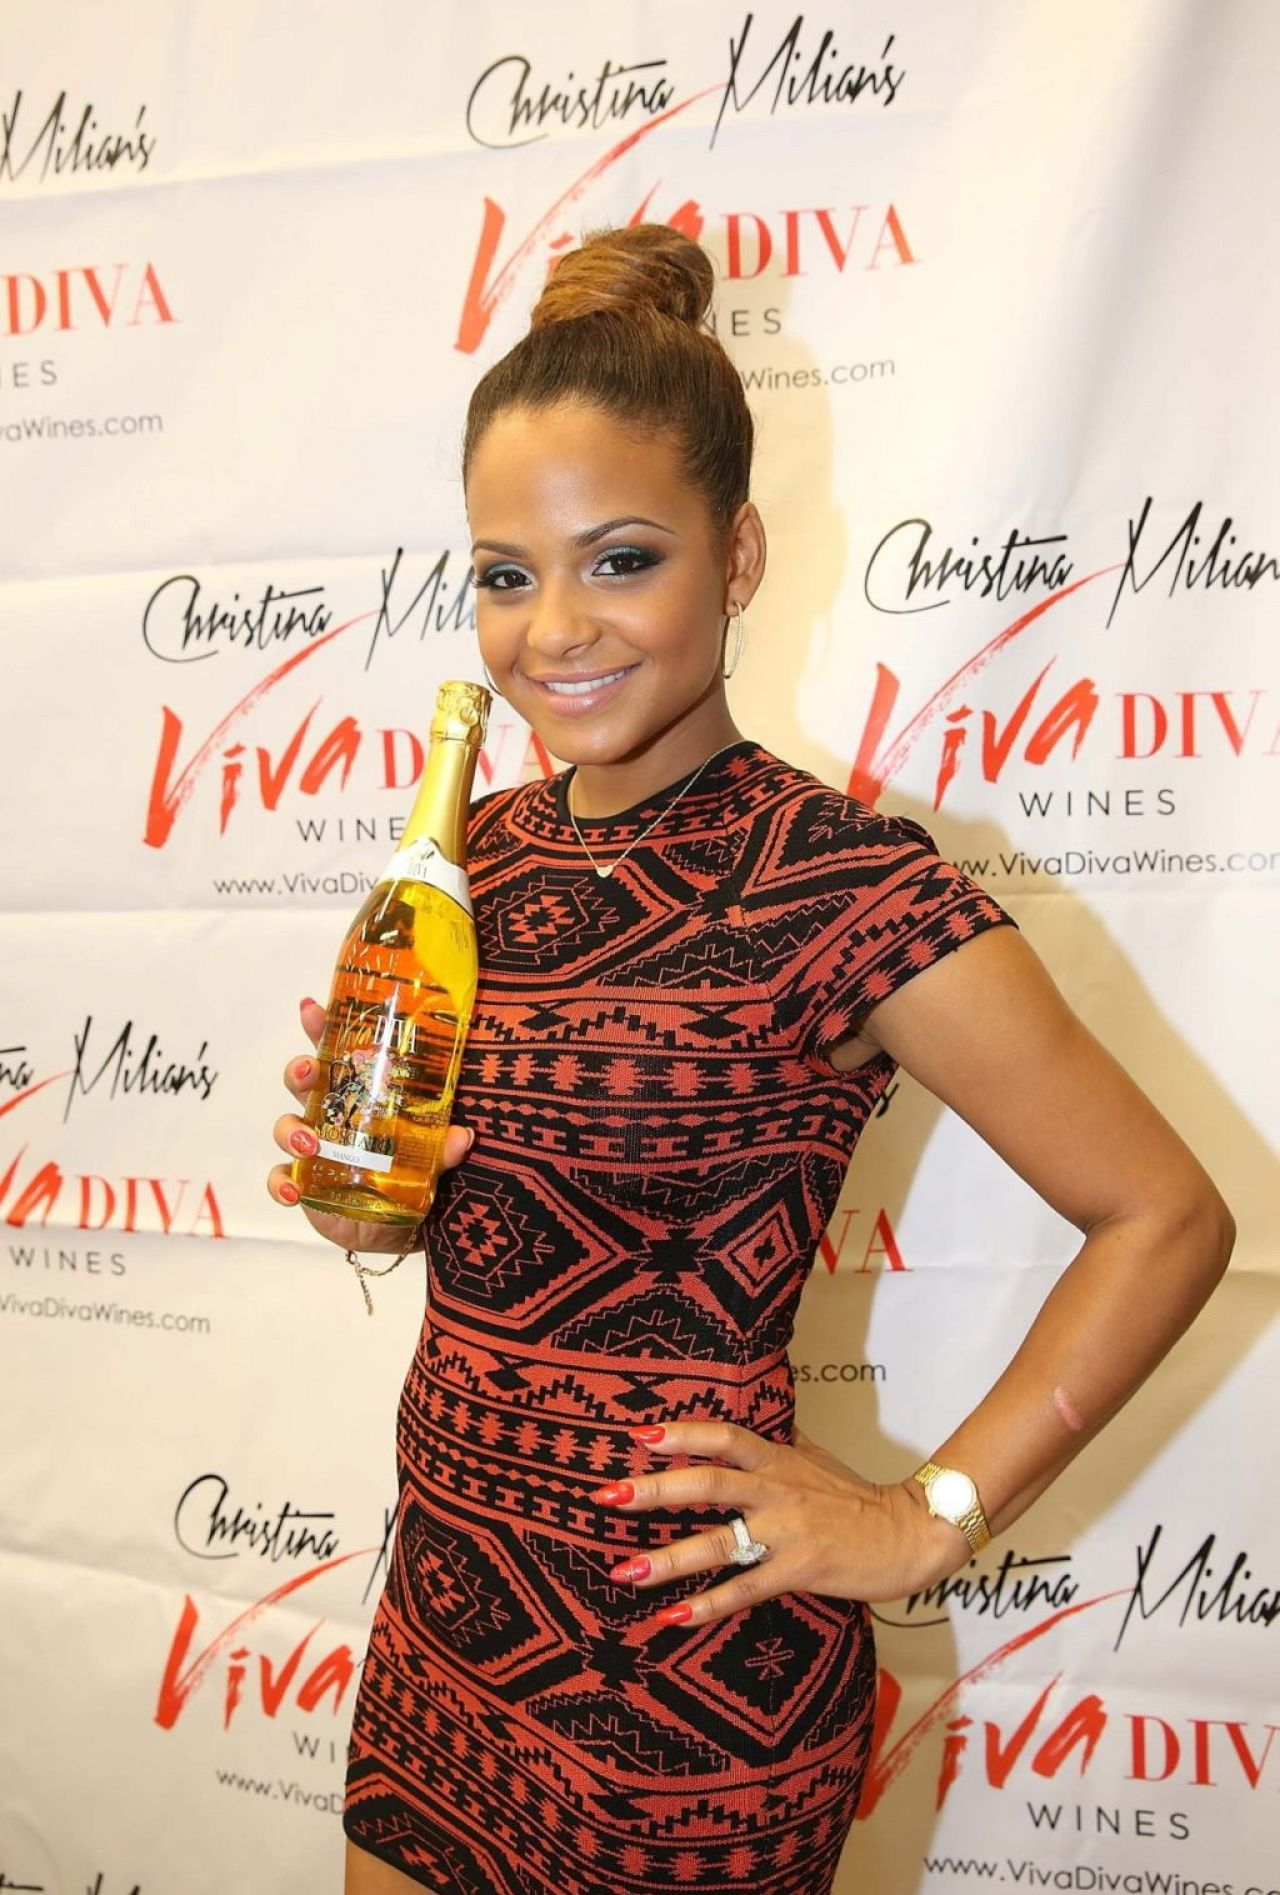 Christina Milian - Viva Diva Wine Signing - Miami December 2013